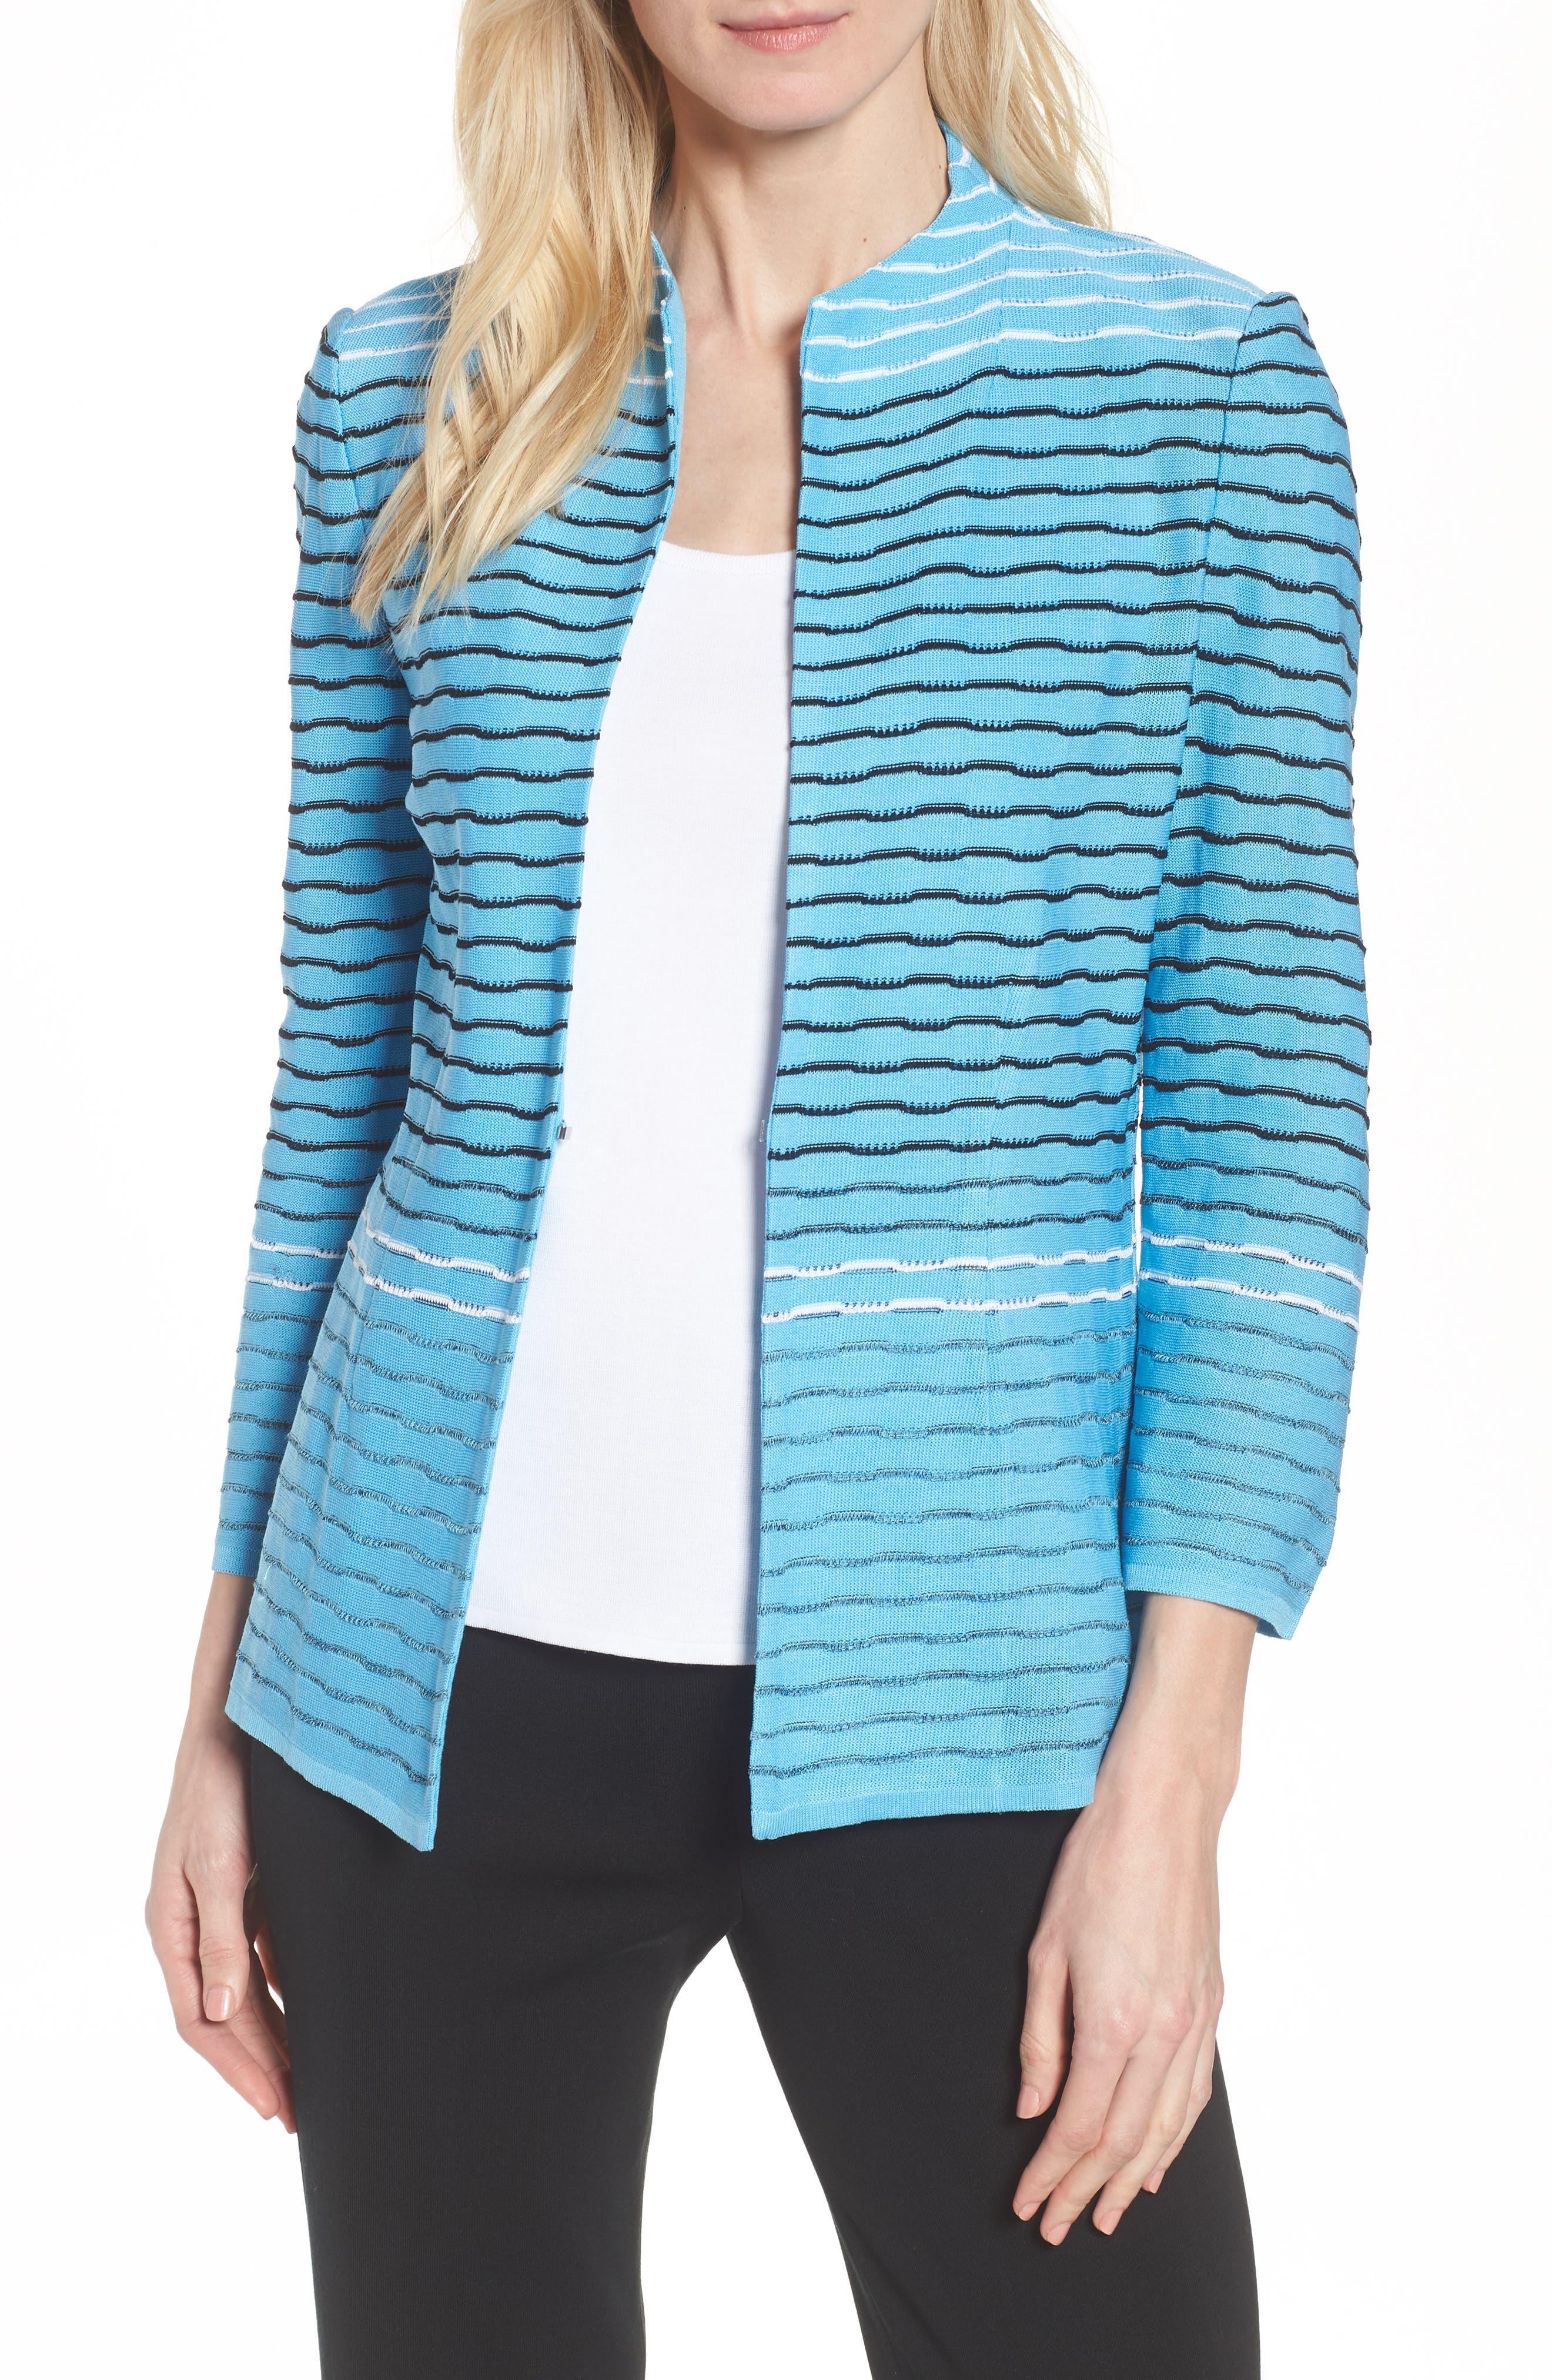 Jacquard Knit Jacket,                         Main,                         color, BLUEBONNET/ BLACK/ WHITE